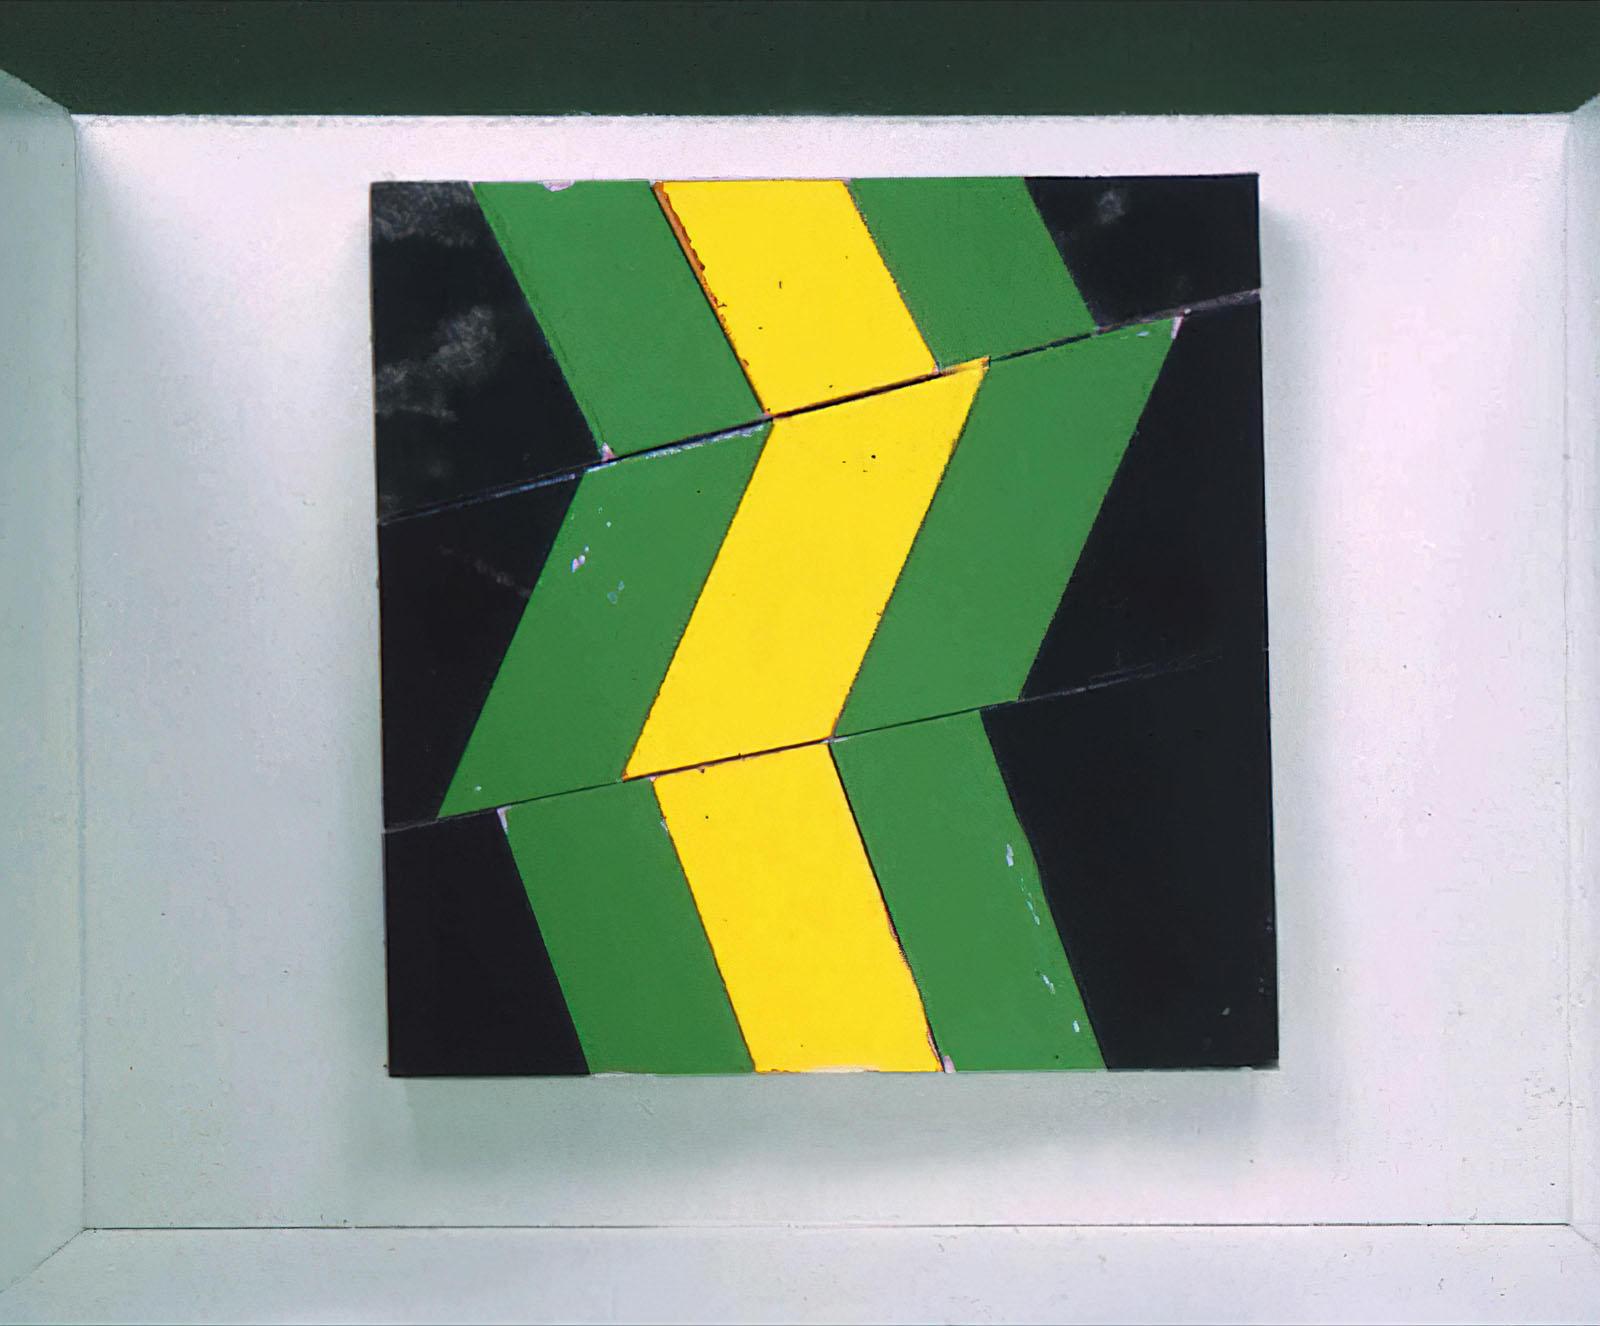 Franz Fedier - Zwei Grün